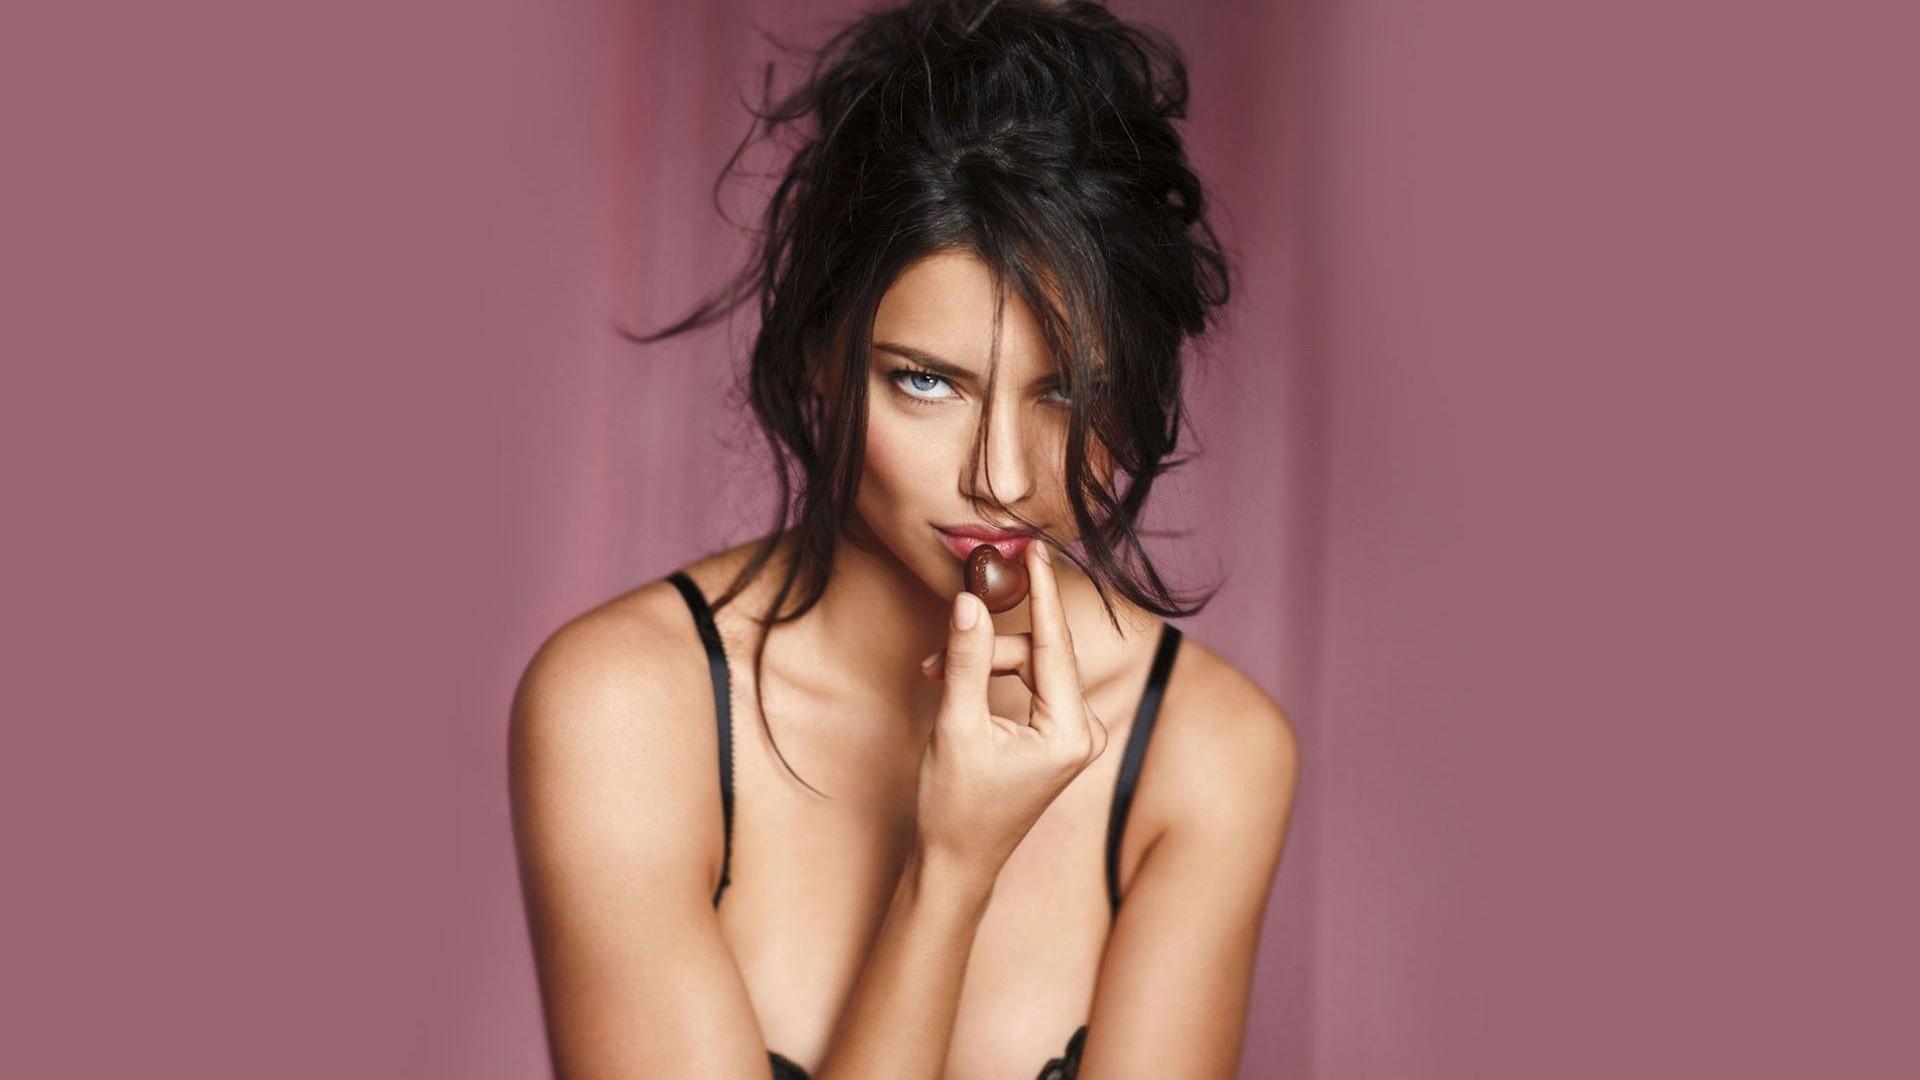 Adriana Lima porno